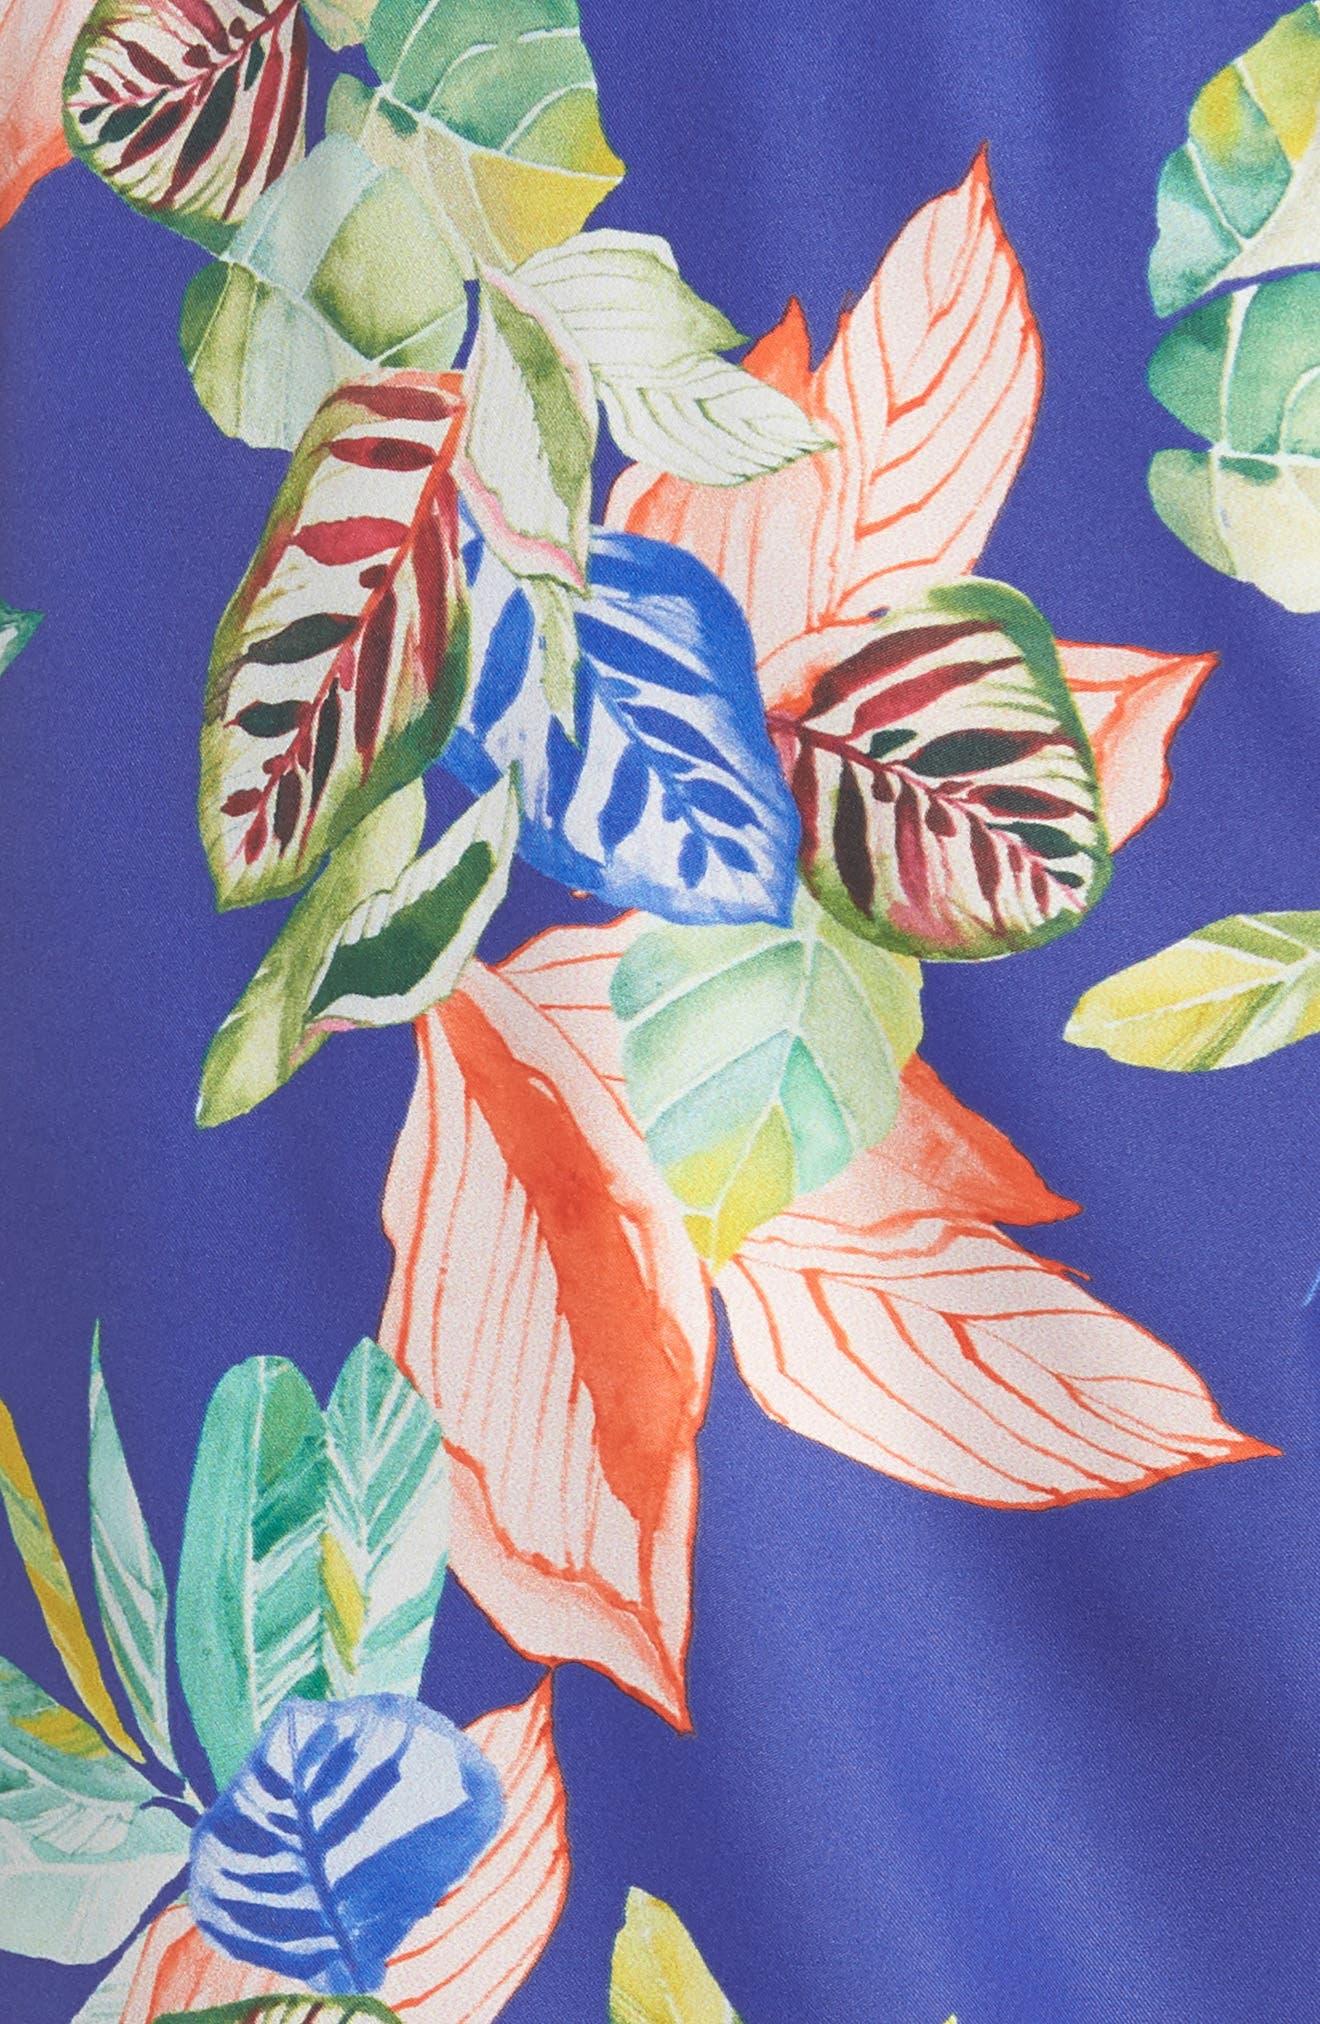 Hollow Wave Swim Trunks,                             Alternate thumbnail 5, color,                             Multicolor